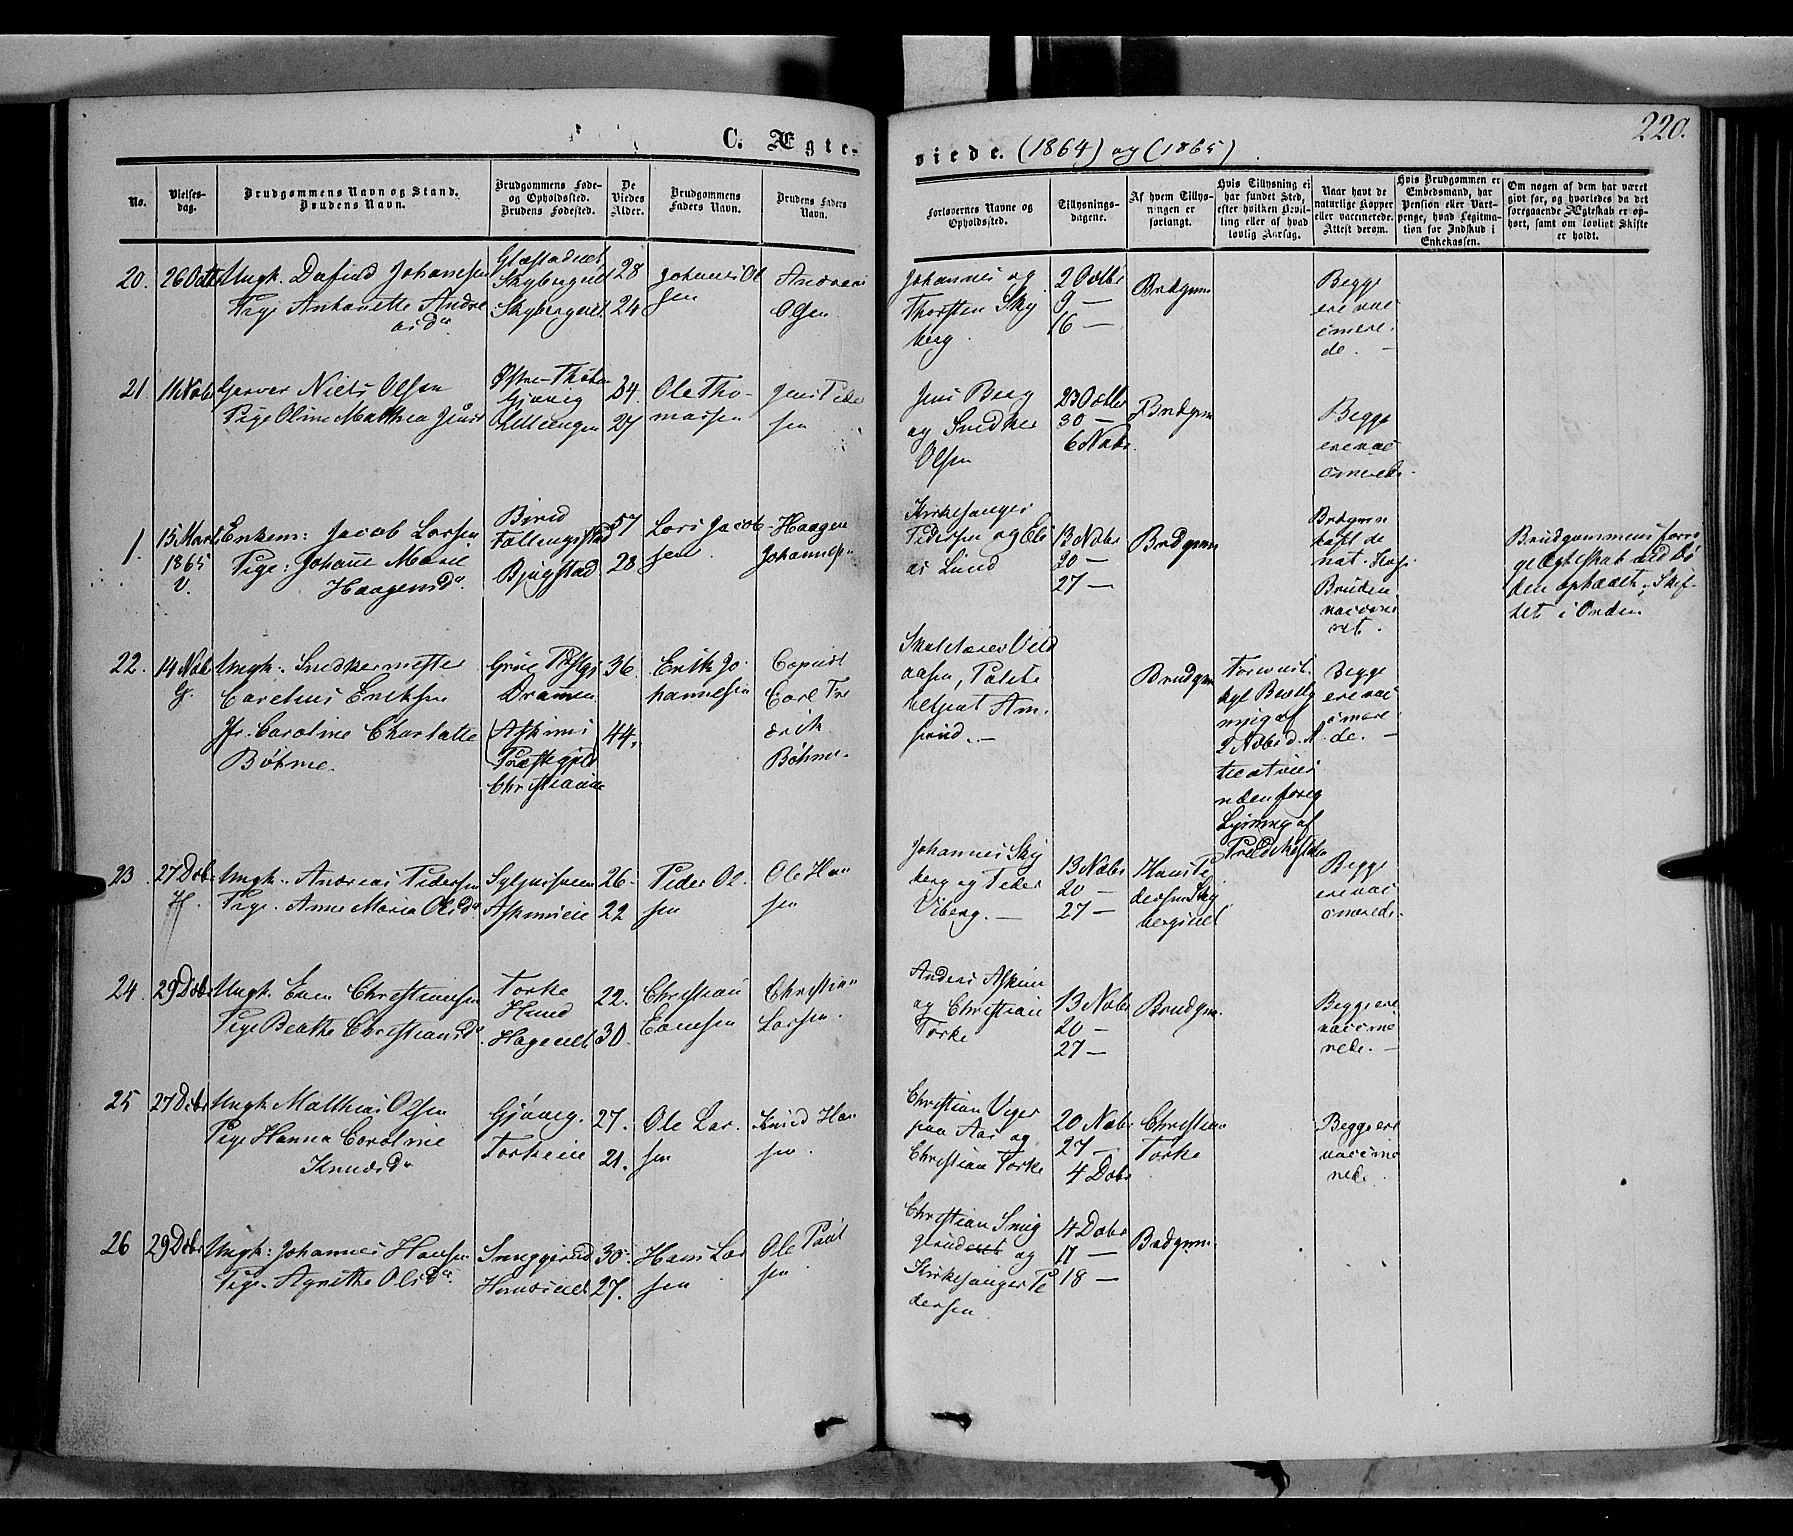 SAH, Vardal prestekontor, H/Ha/Haa/L0006: Ministerialbok nr. 6, 1854-1866, s. 220